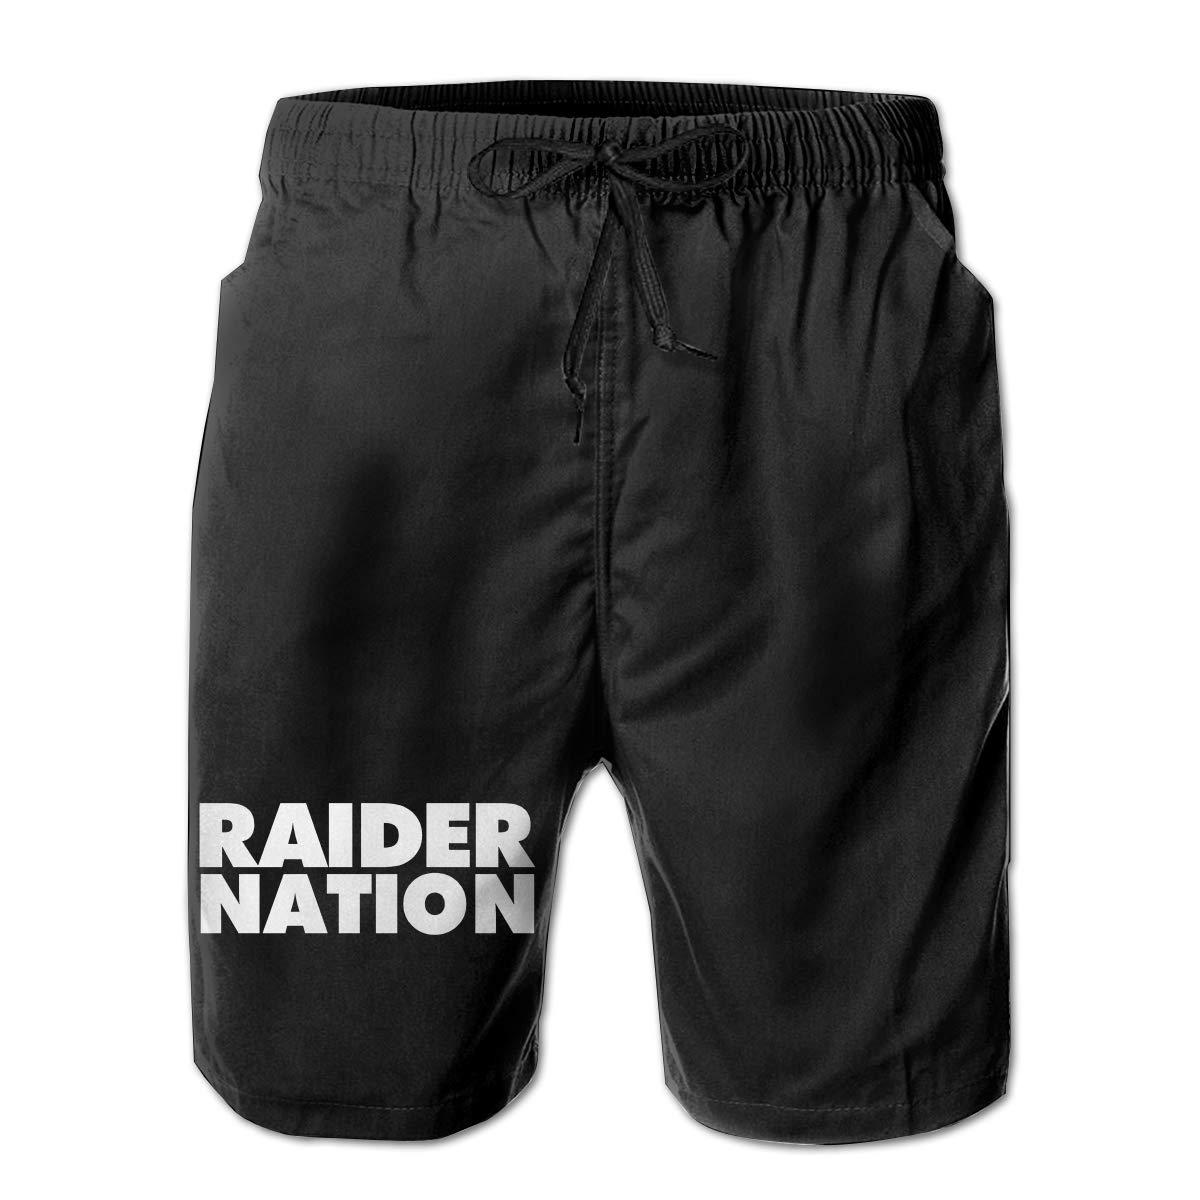 Straight Outta Raider Nation Mens Summer Casual Shorts,Beach Shorts Swim Trunks